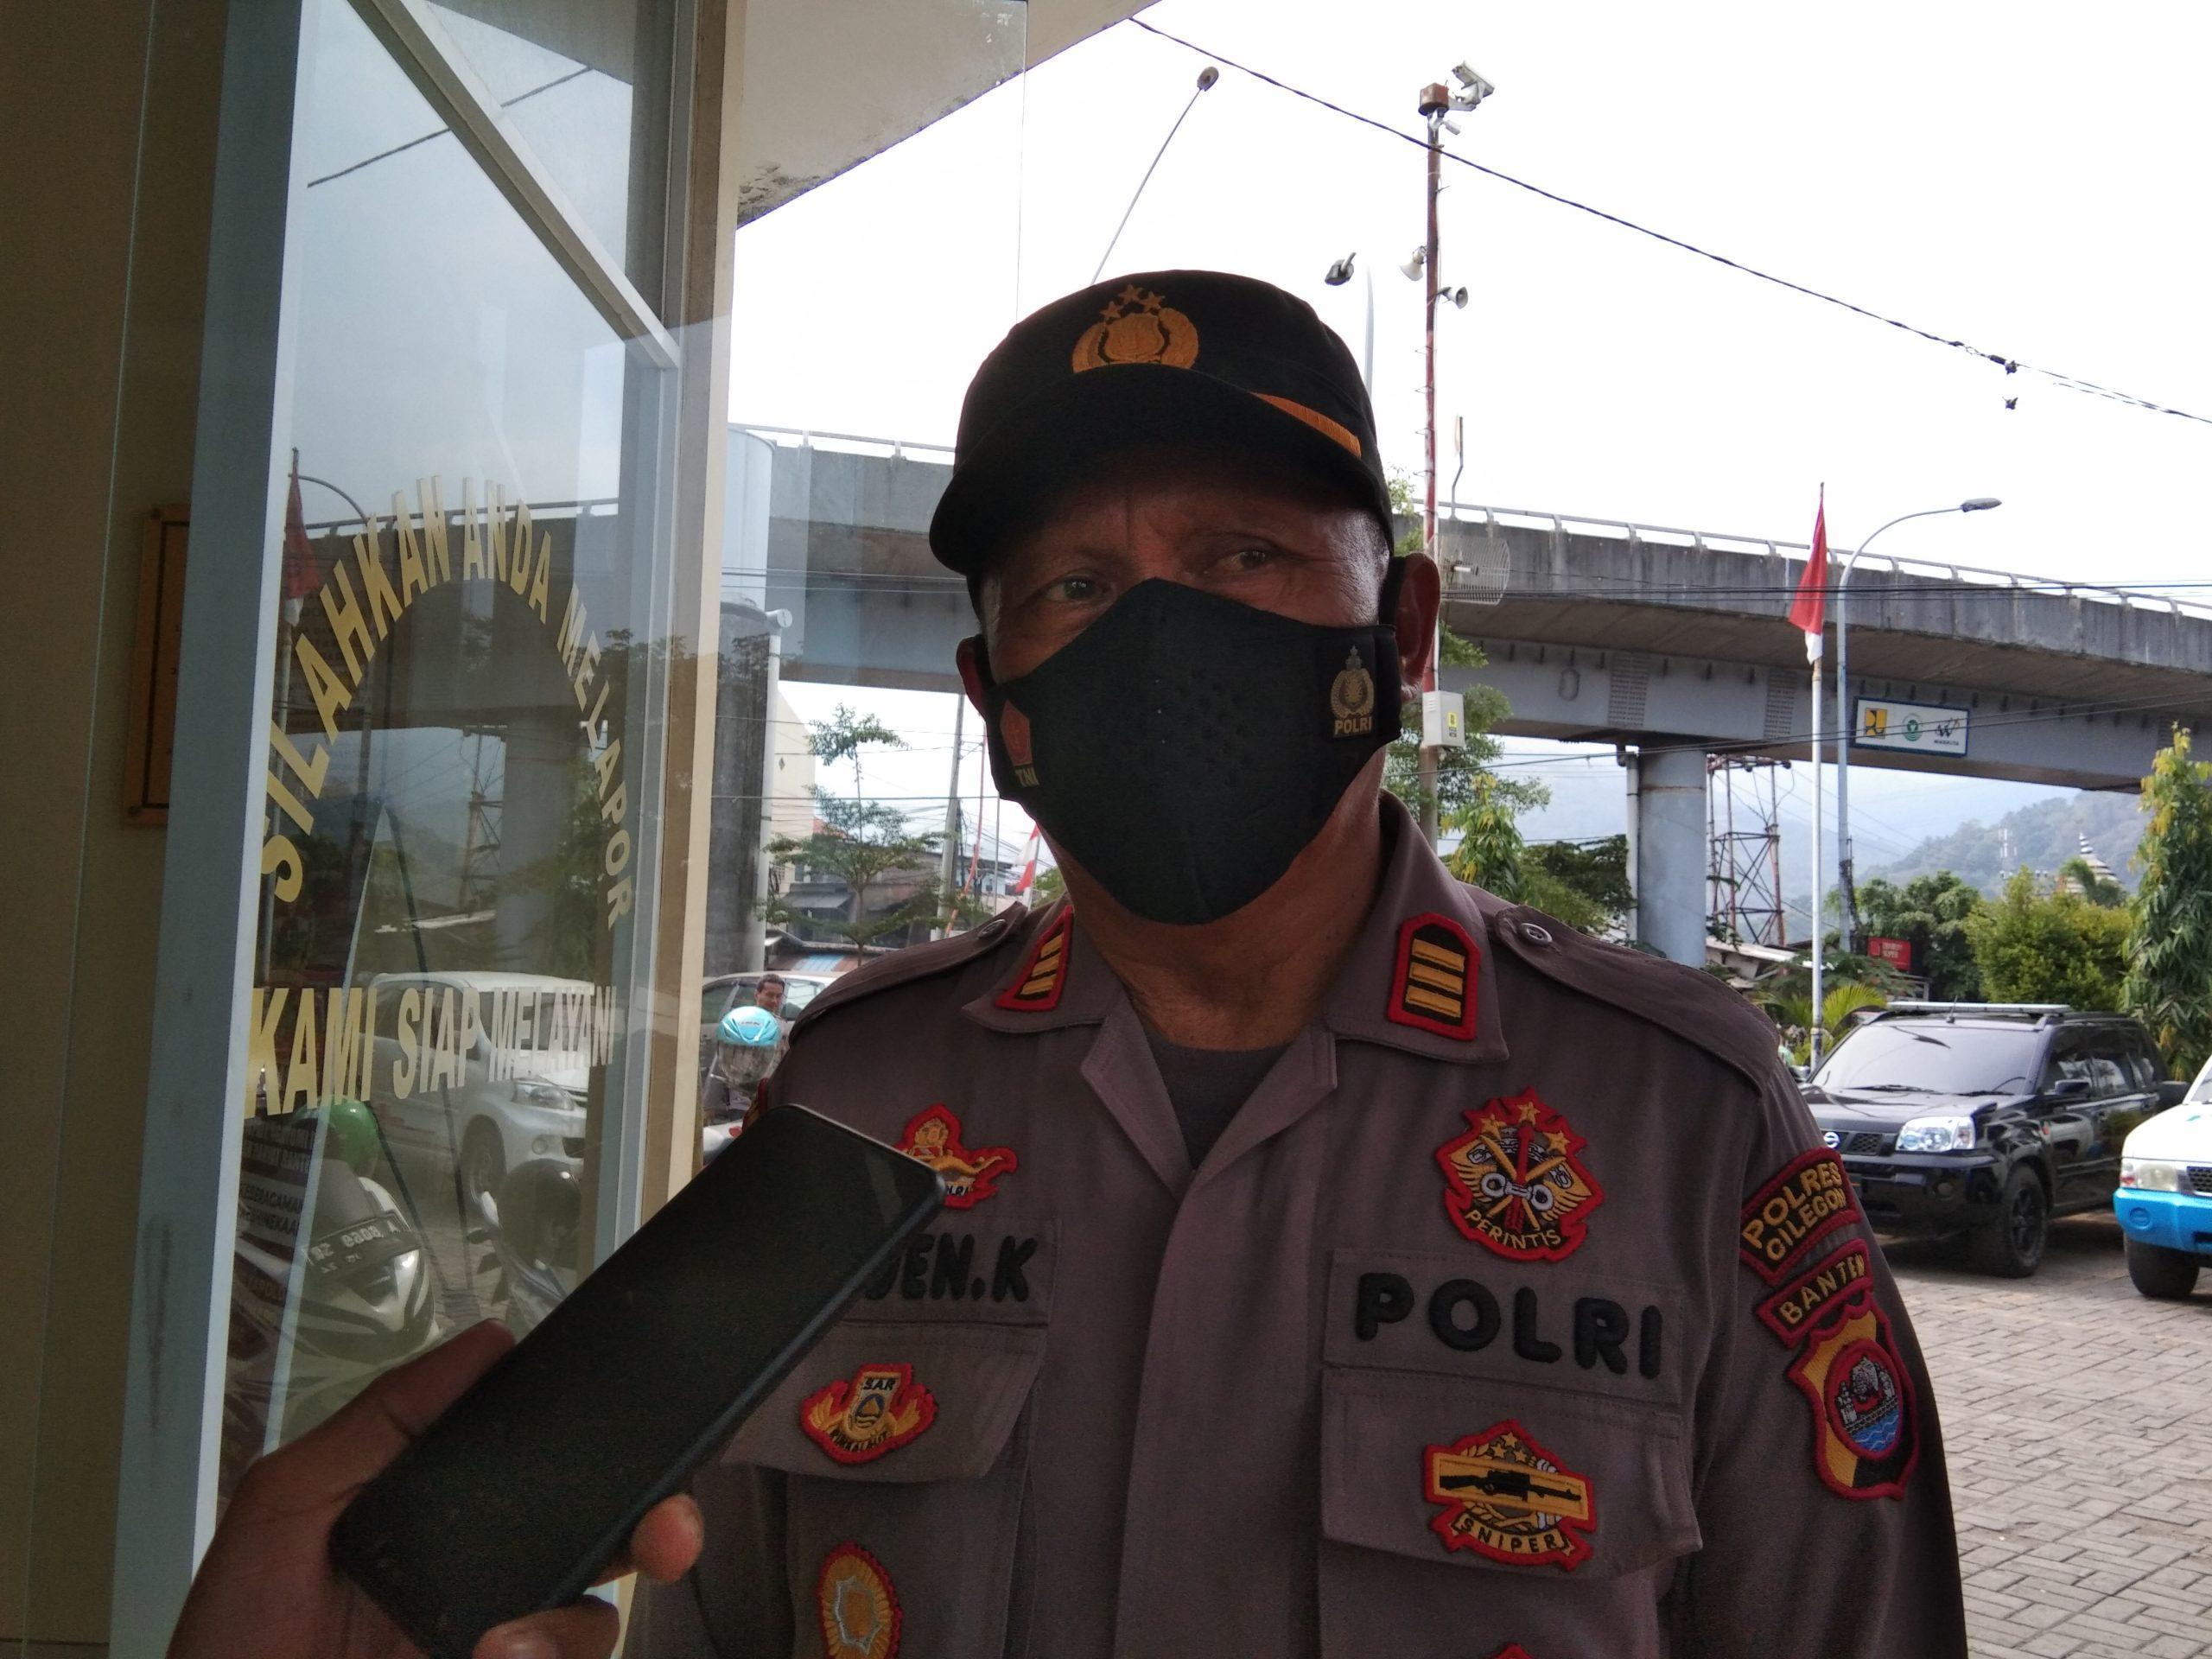 Sopir Mobil Muatan Barang Dicokok Polisi Kepergok Pakai Surat Antigen Palsu; Ketahuan Gara-gara Ini